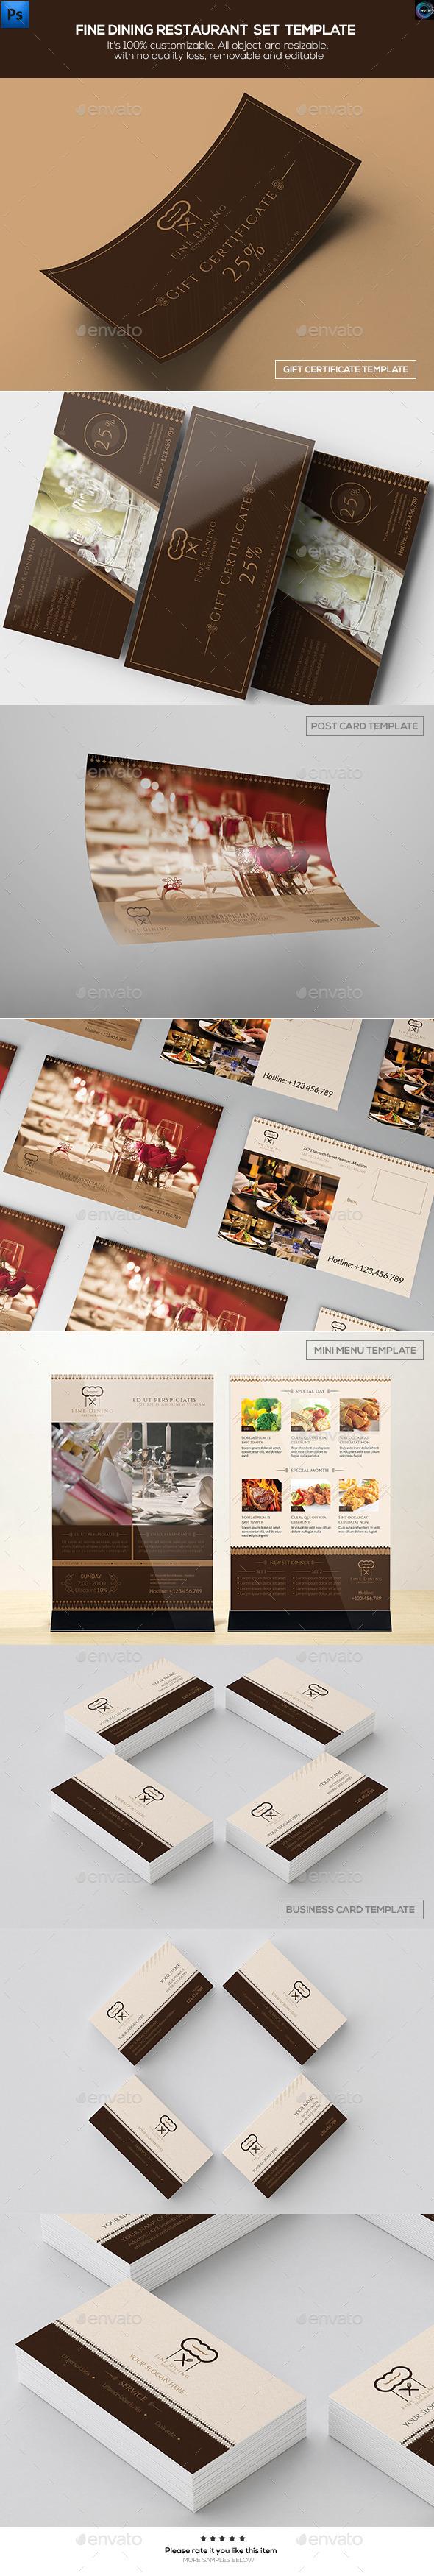 A5 Menu Graphics Designs Templates From Graphicriver